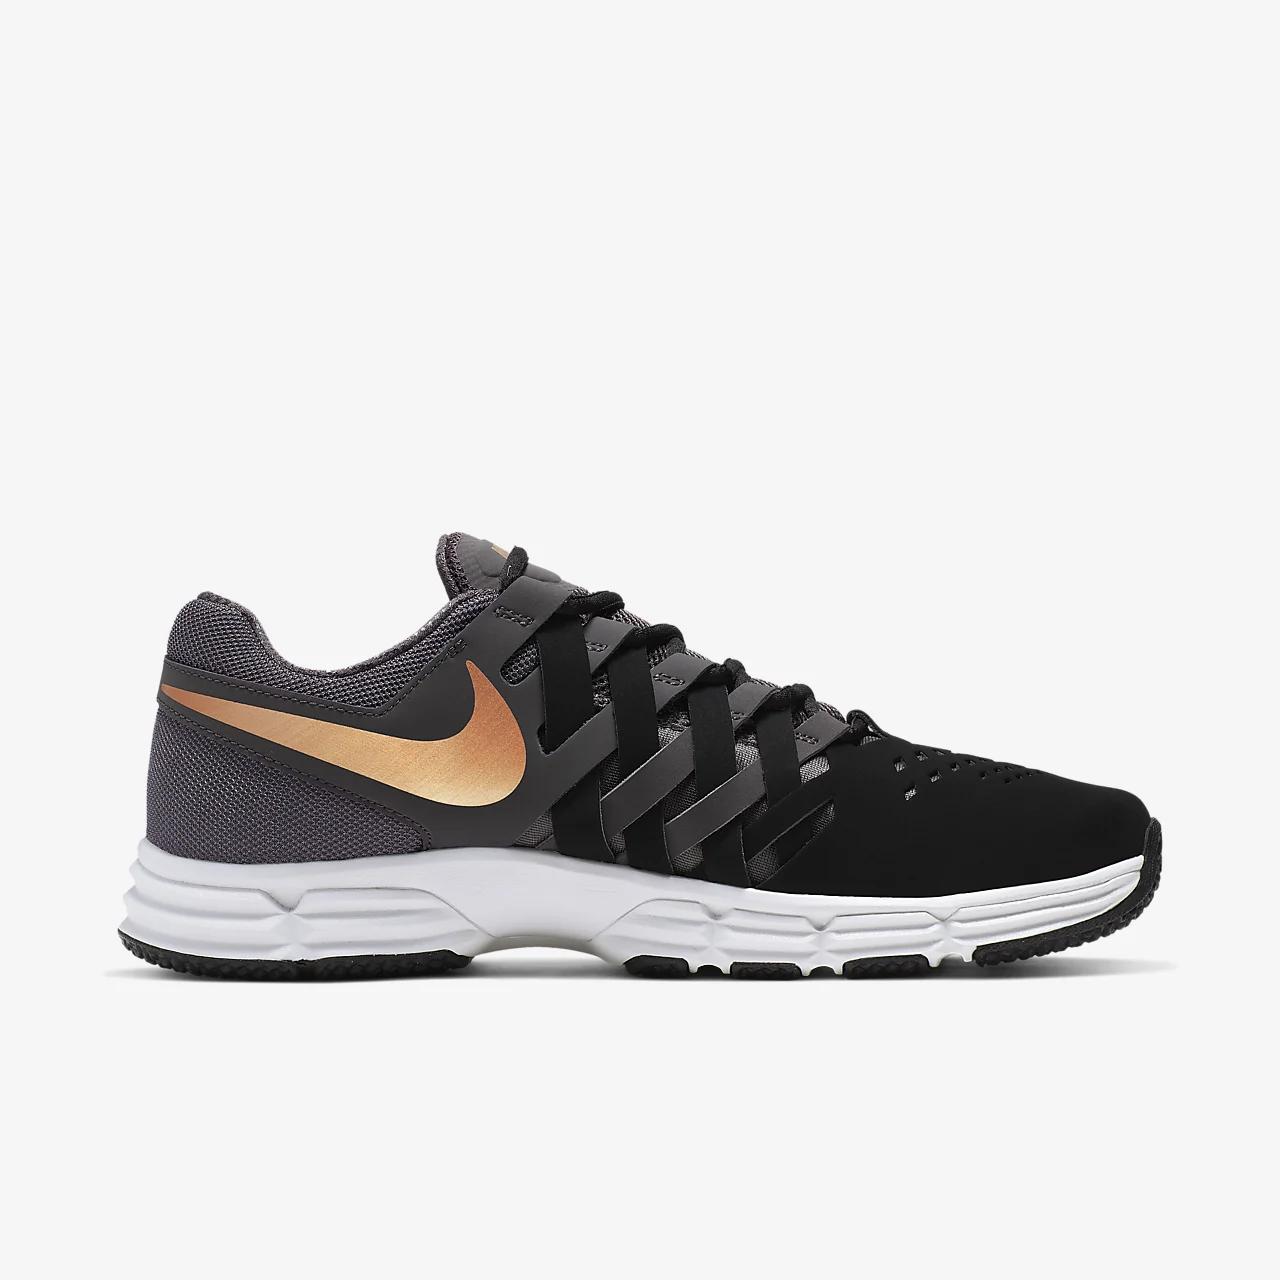 Nike Lunar Fingertrap TR Men's Gym/Gameday Shoe 898066-015